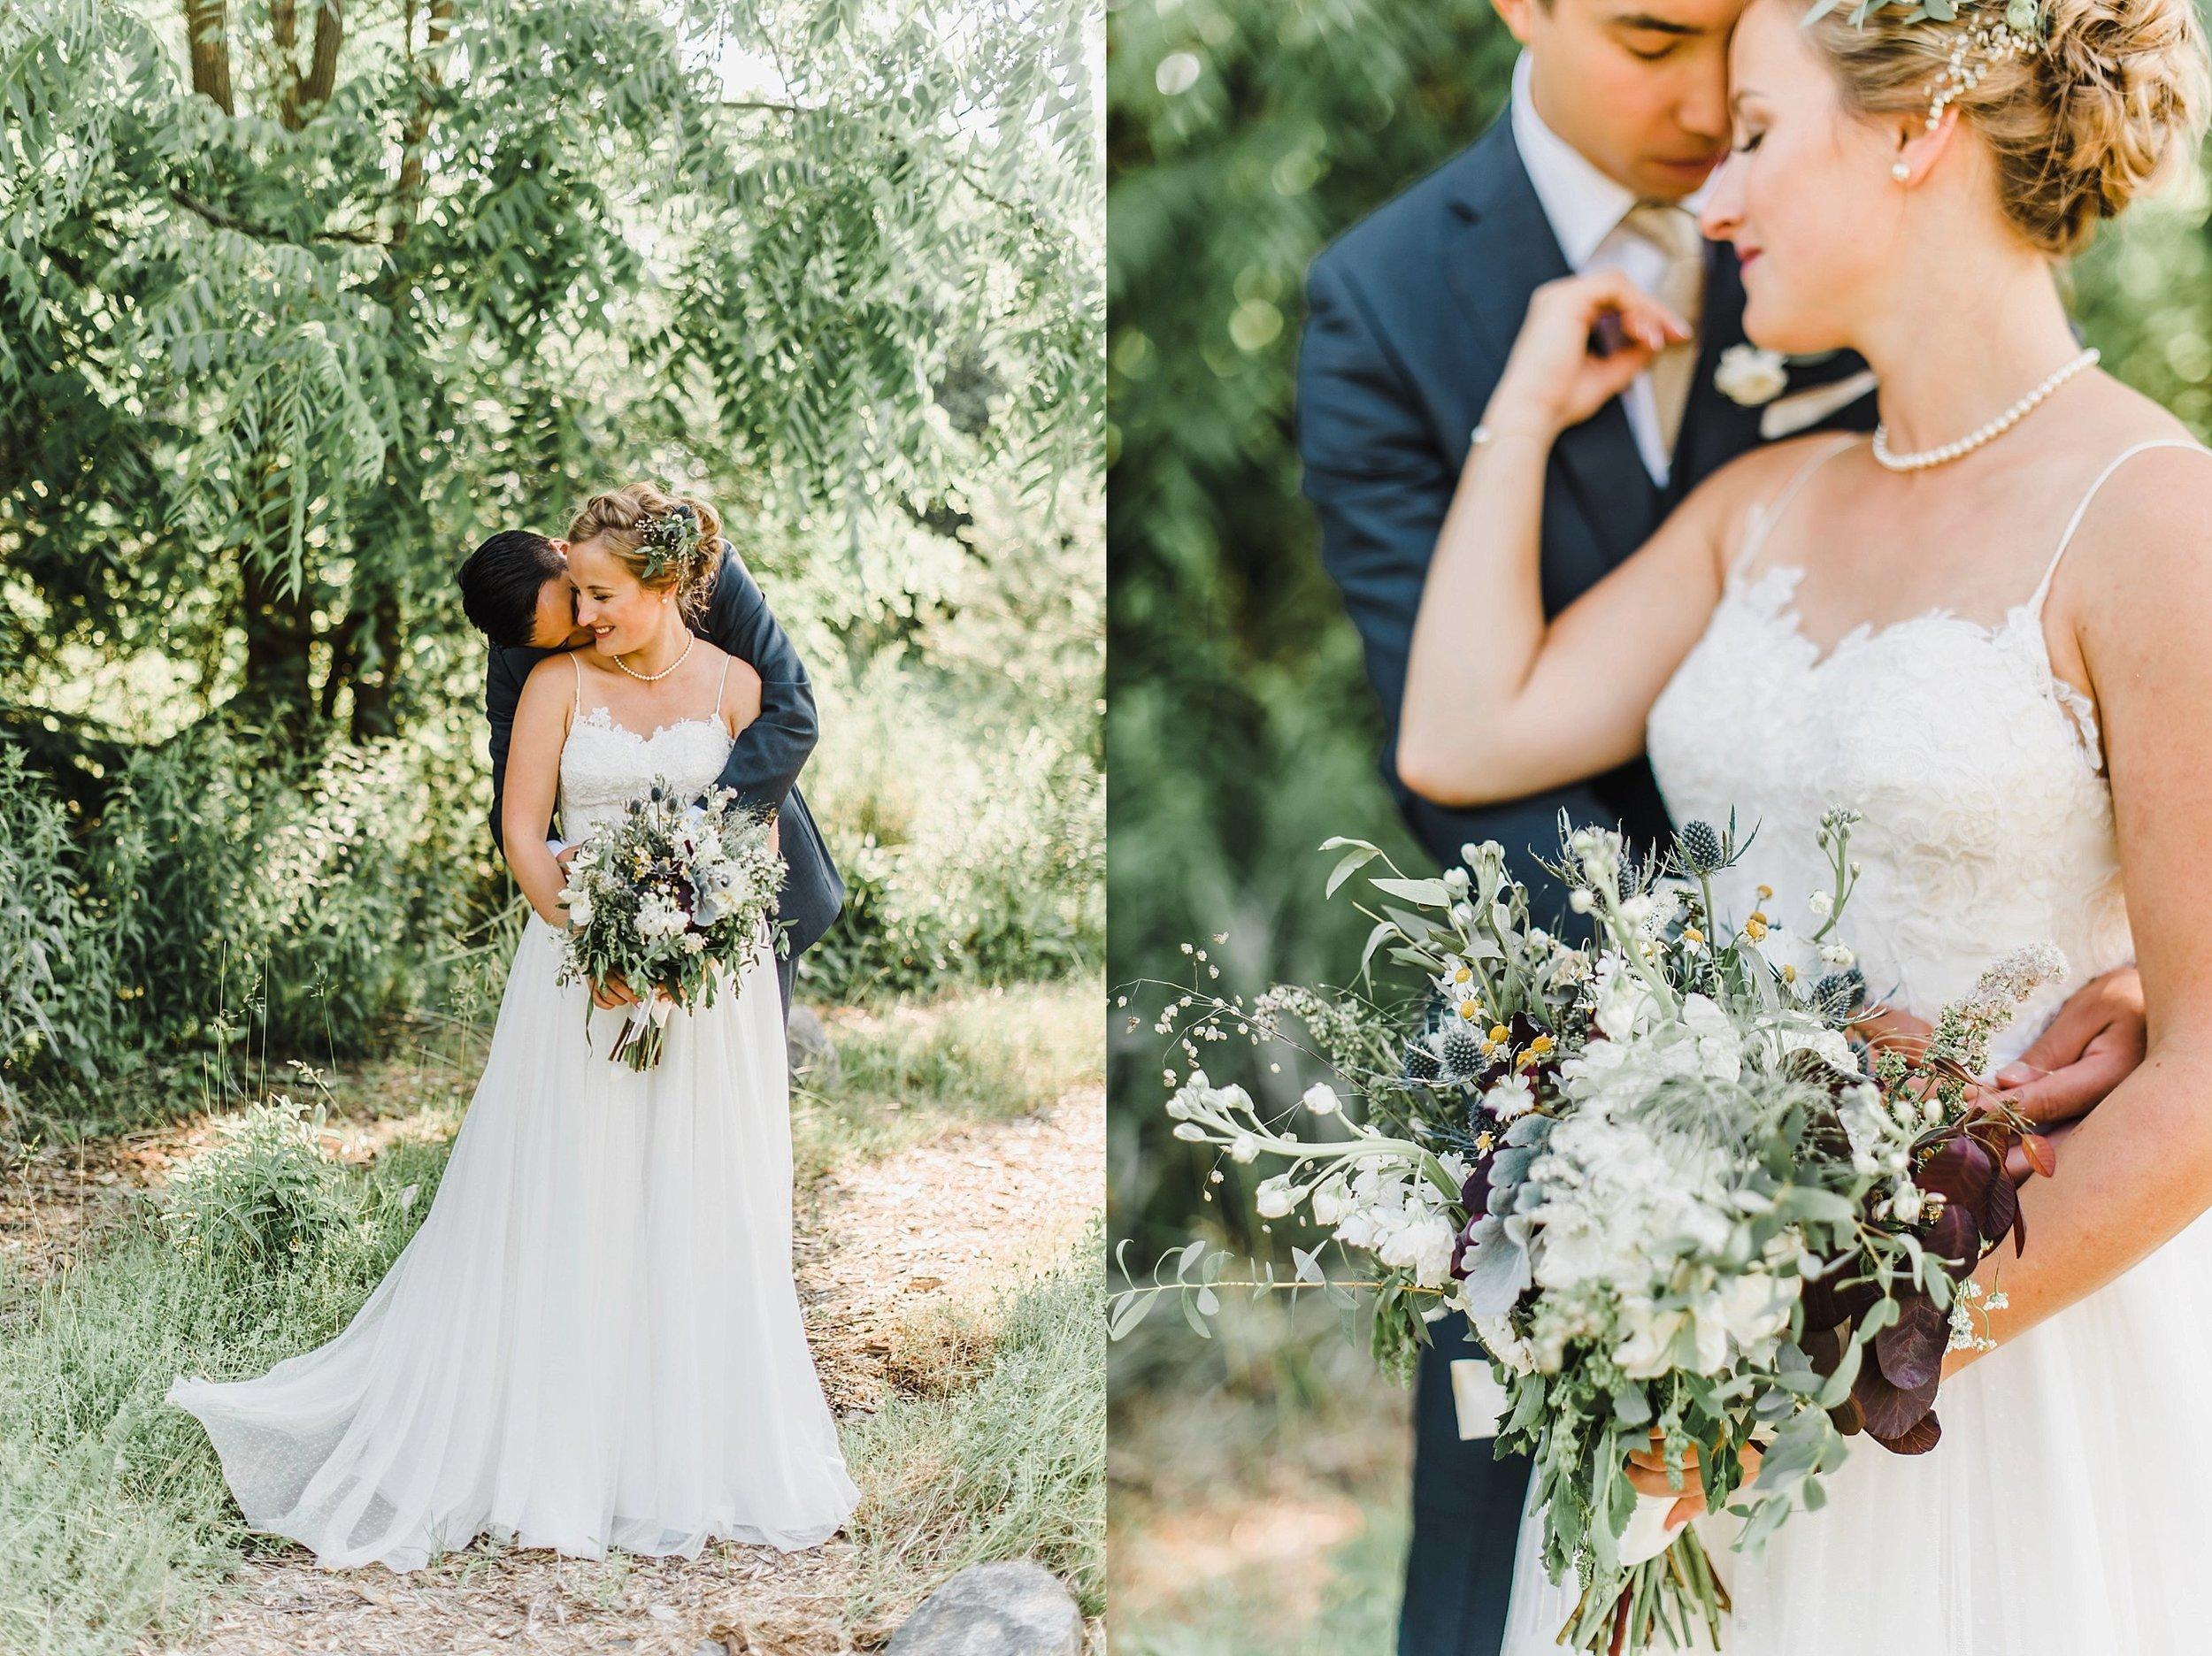 light airy indie fine art ottawa wedding photographer | Ali and Batoul Photography_0842.jpg